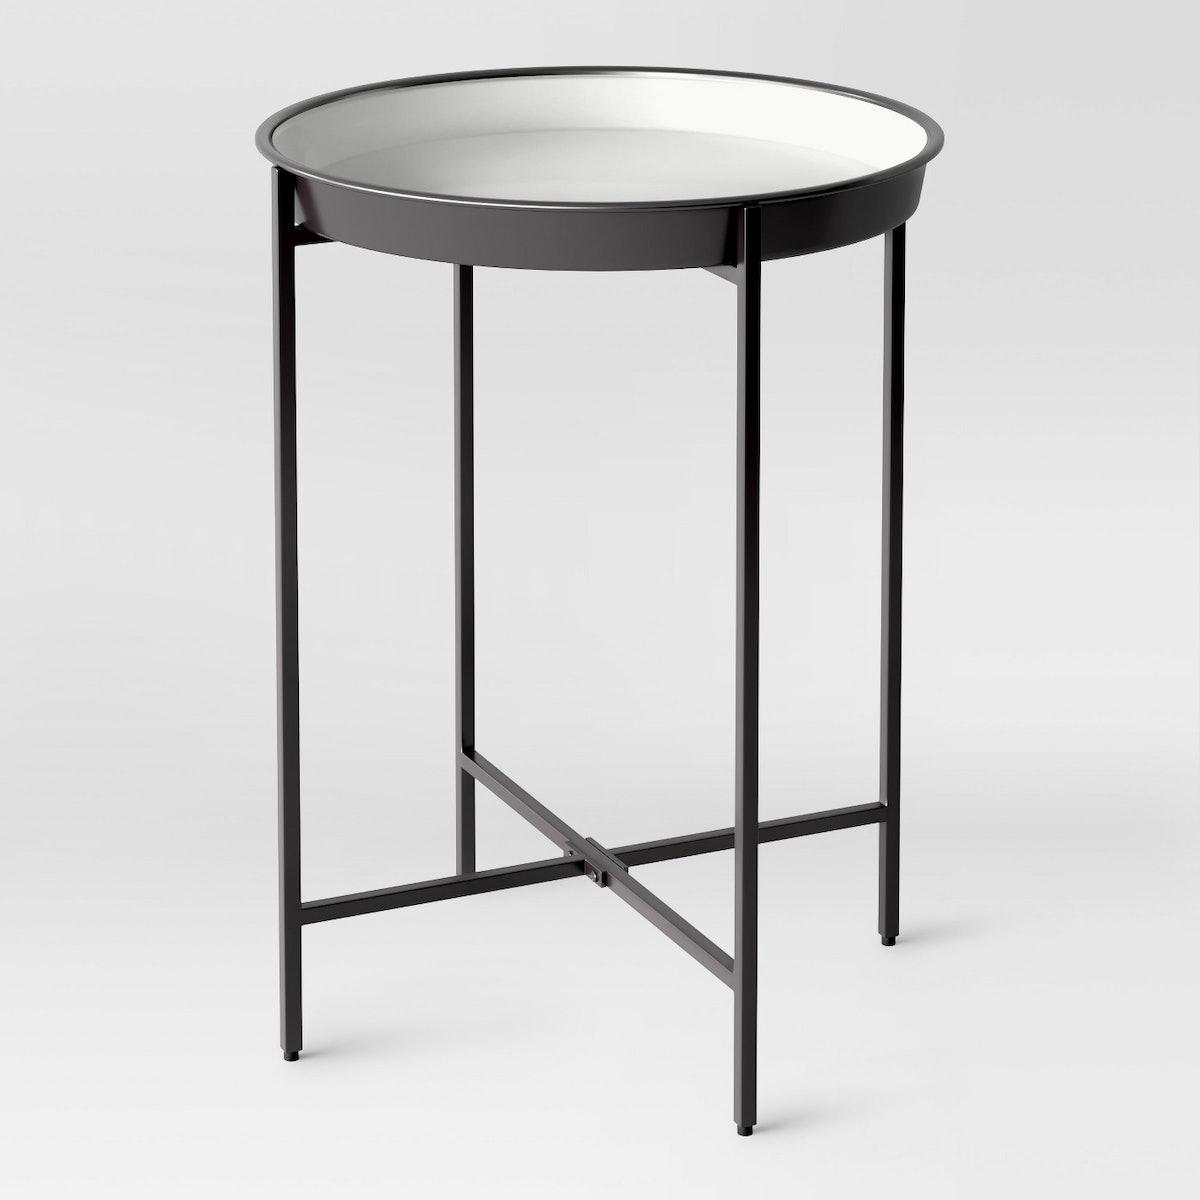 Pradet Tray Accent Table Black/White